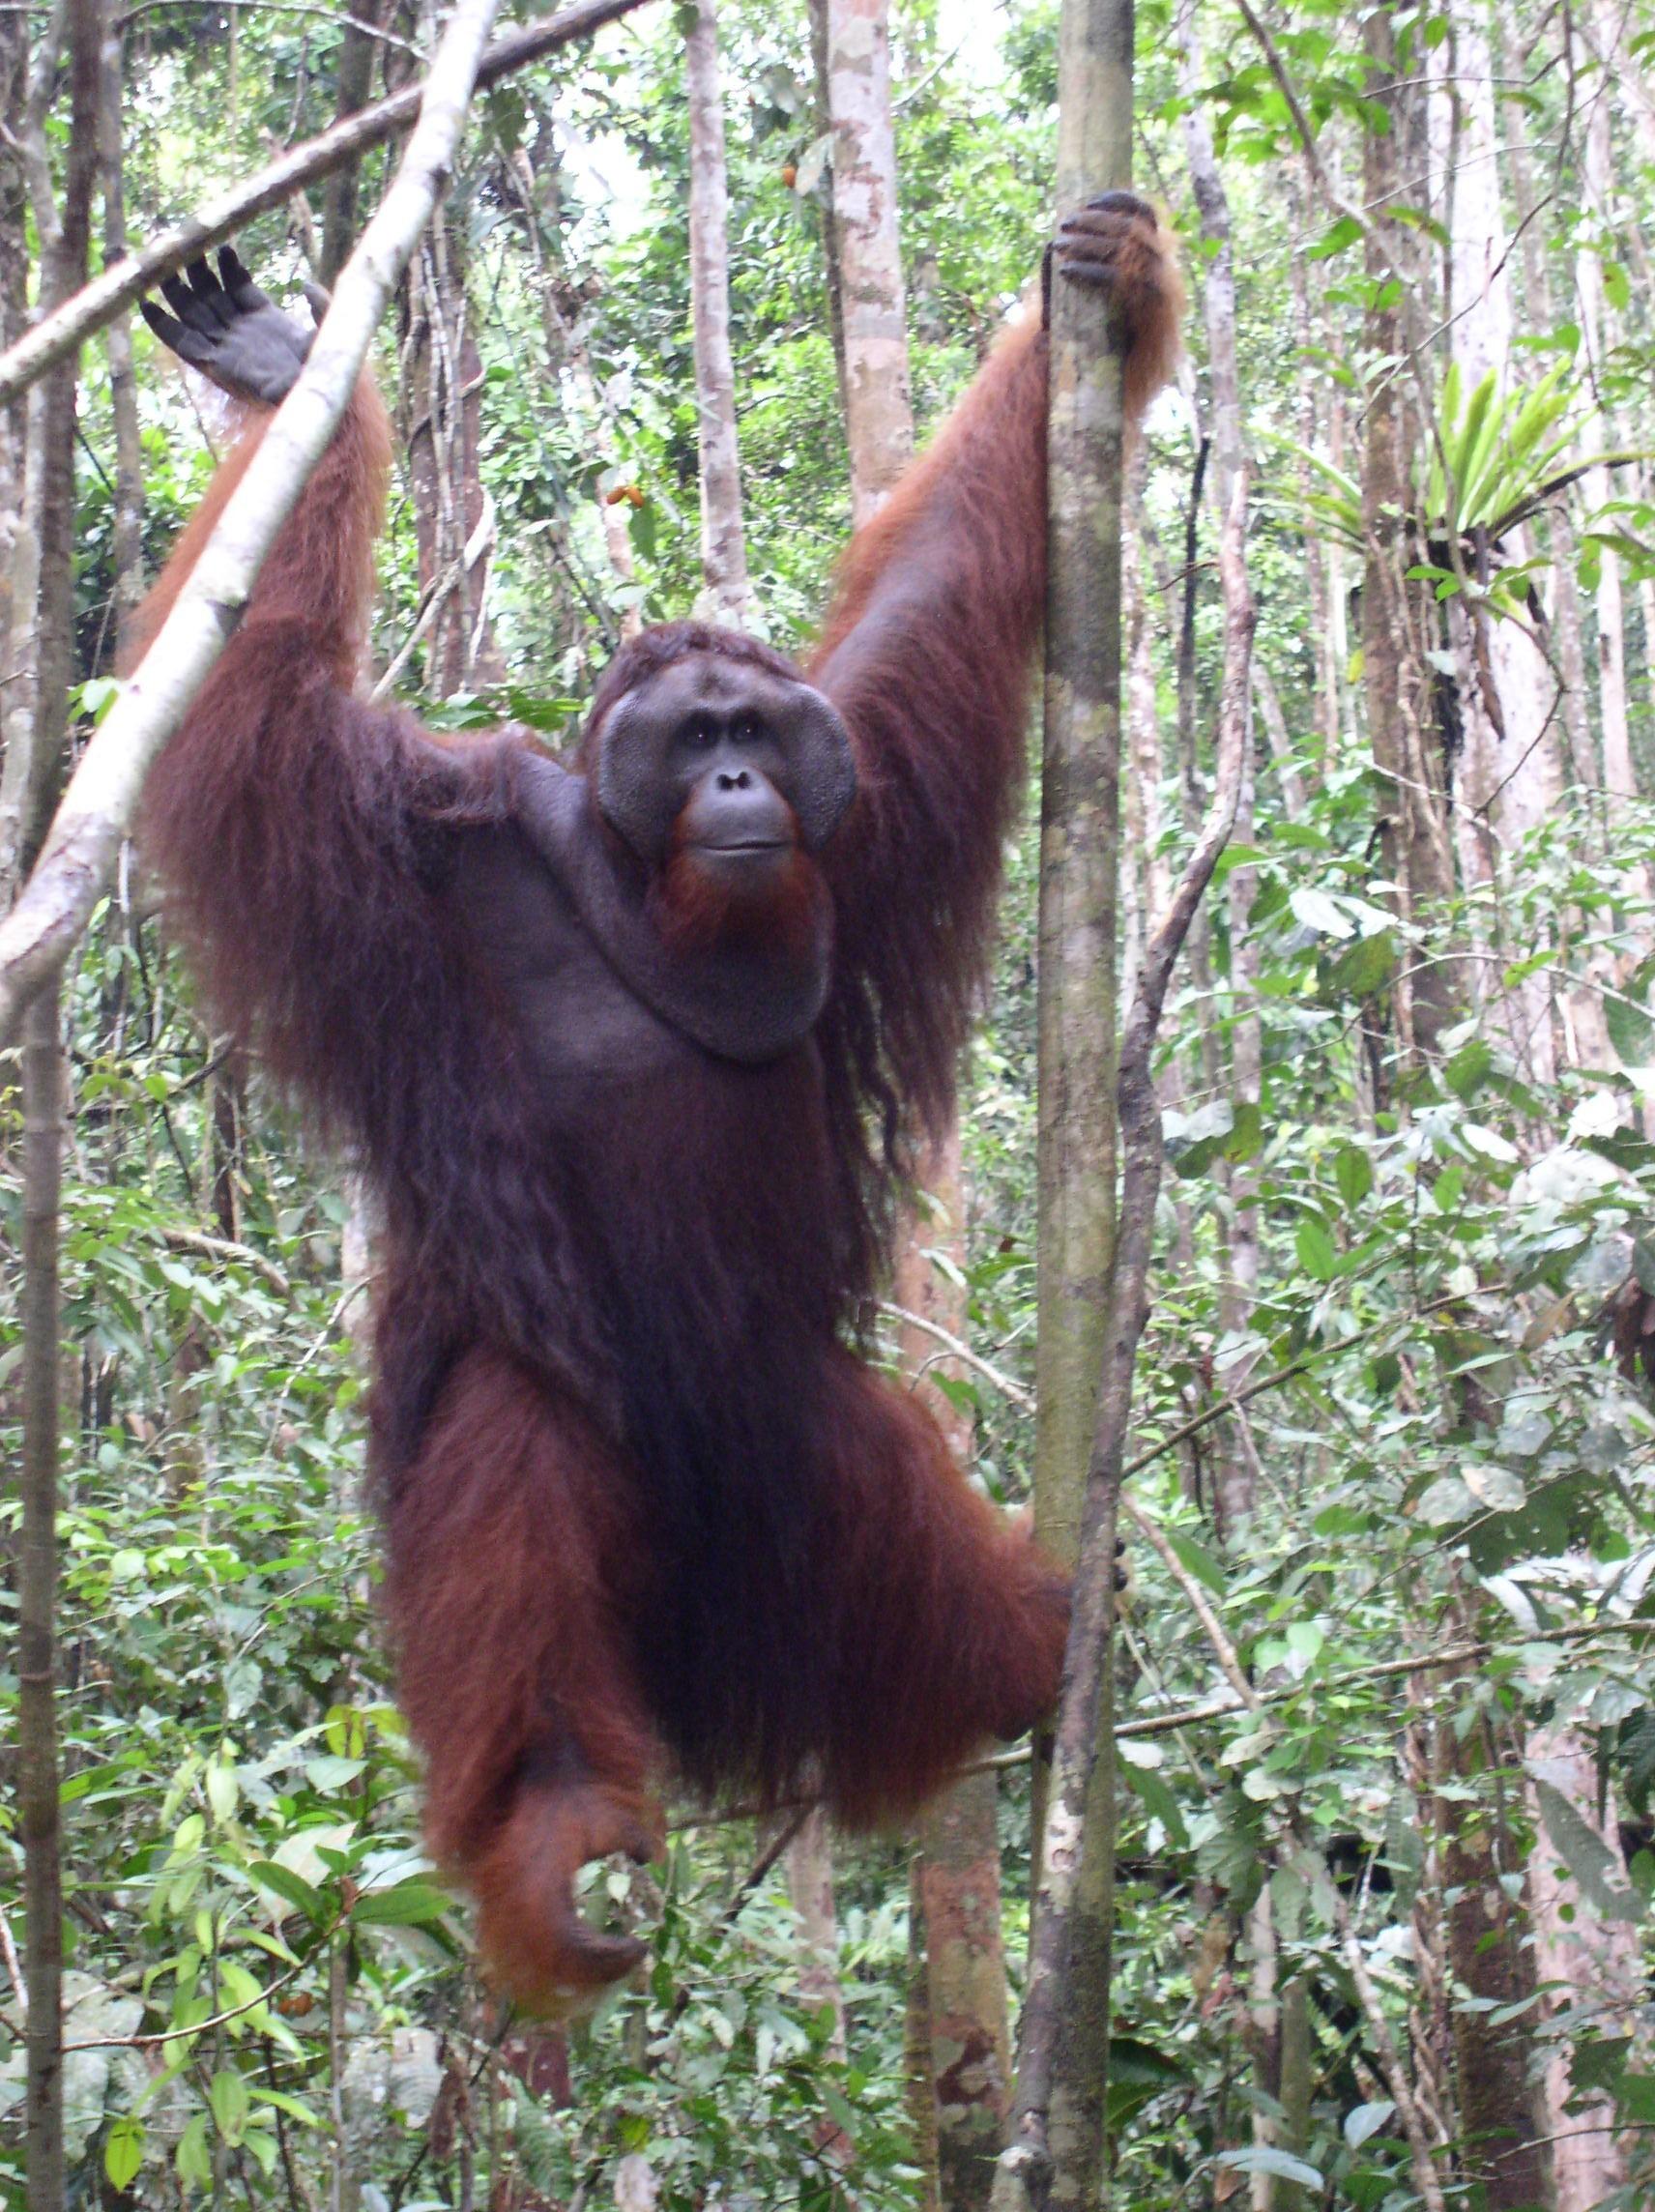 Ritchie Large Male Orangutan In Borneo Forest Emily